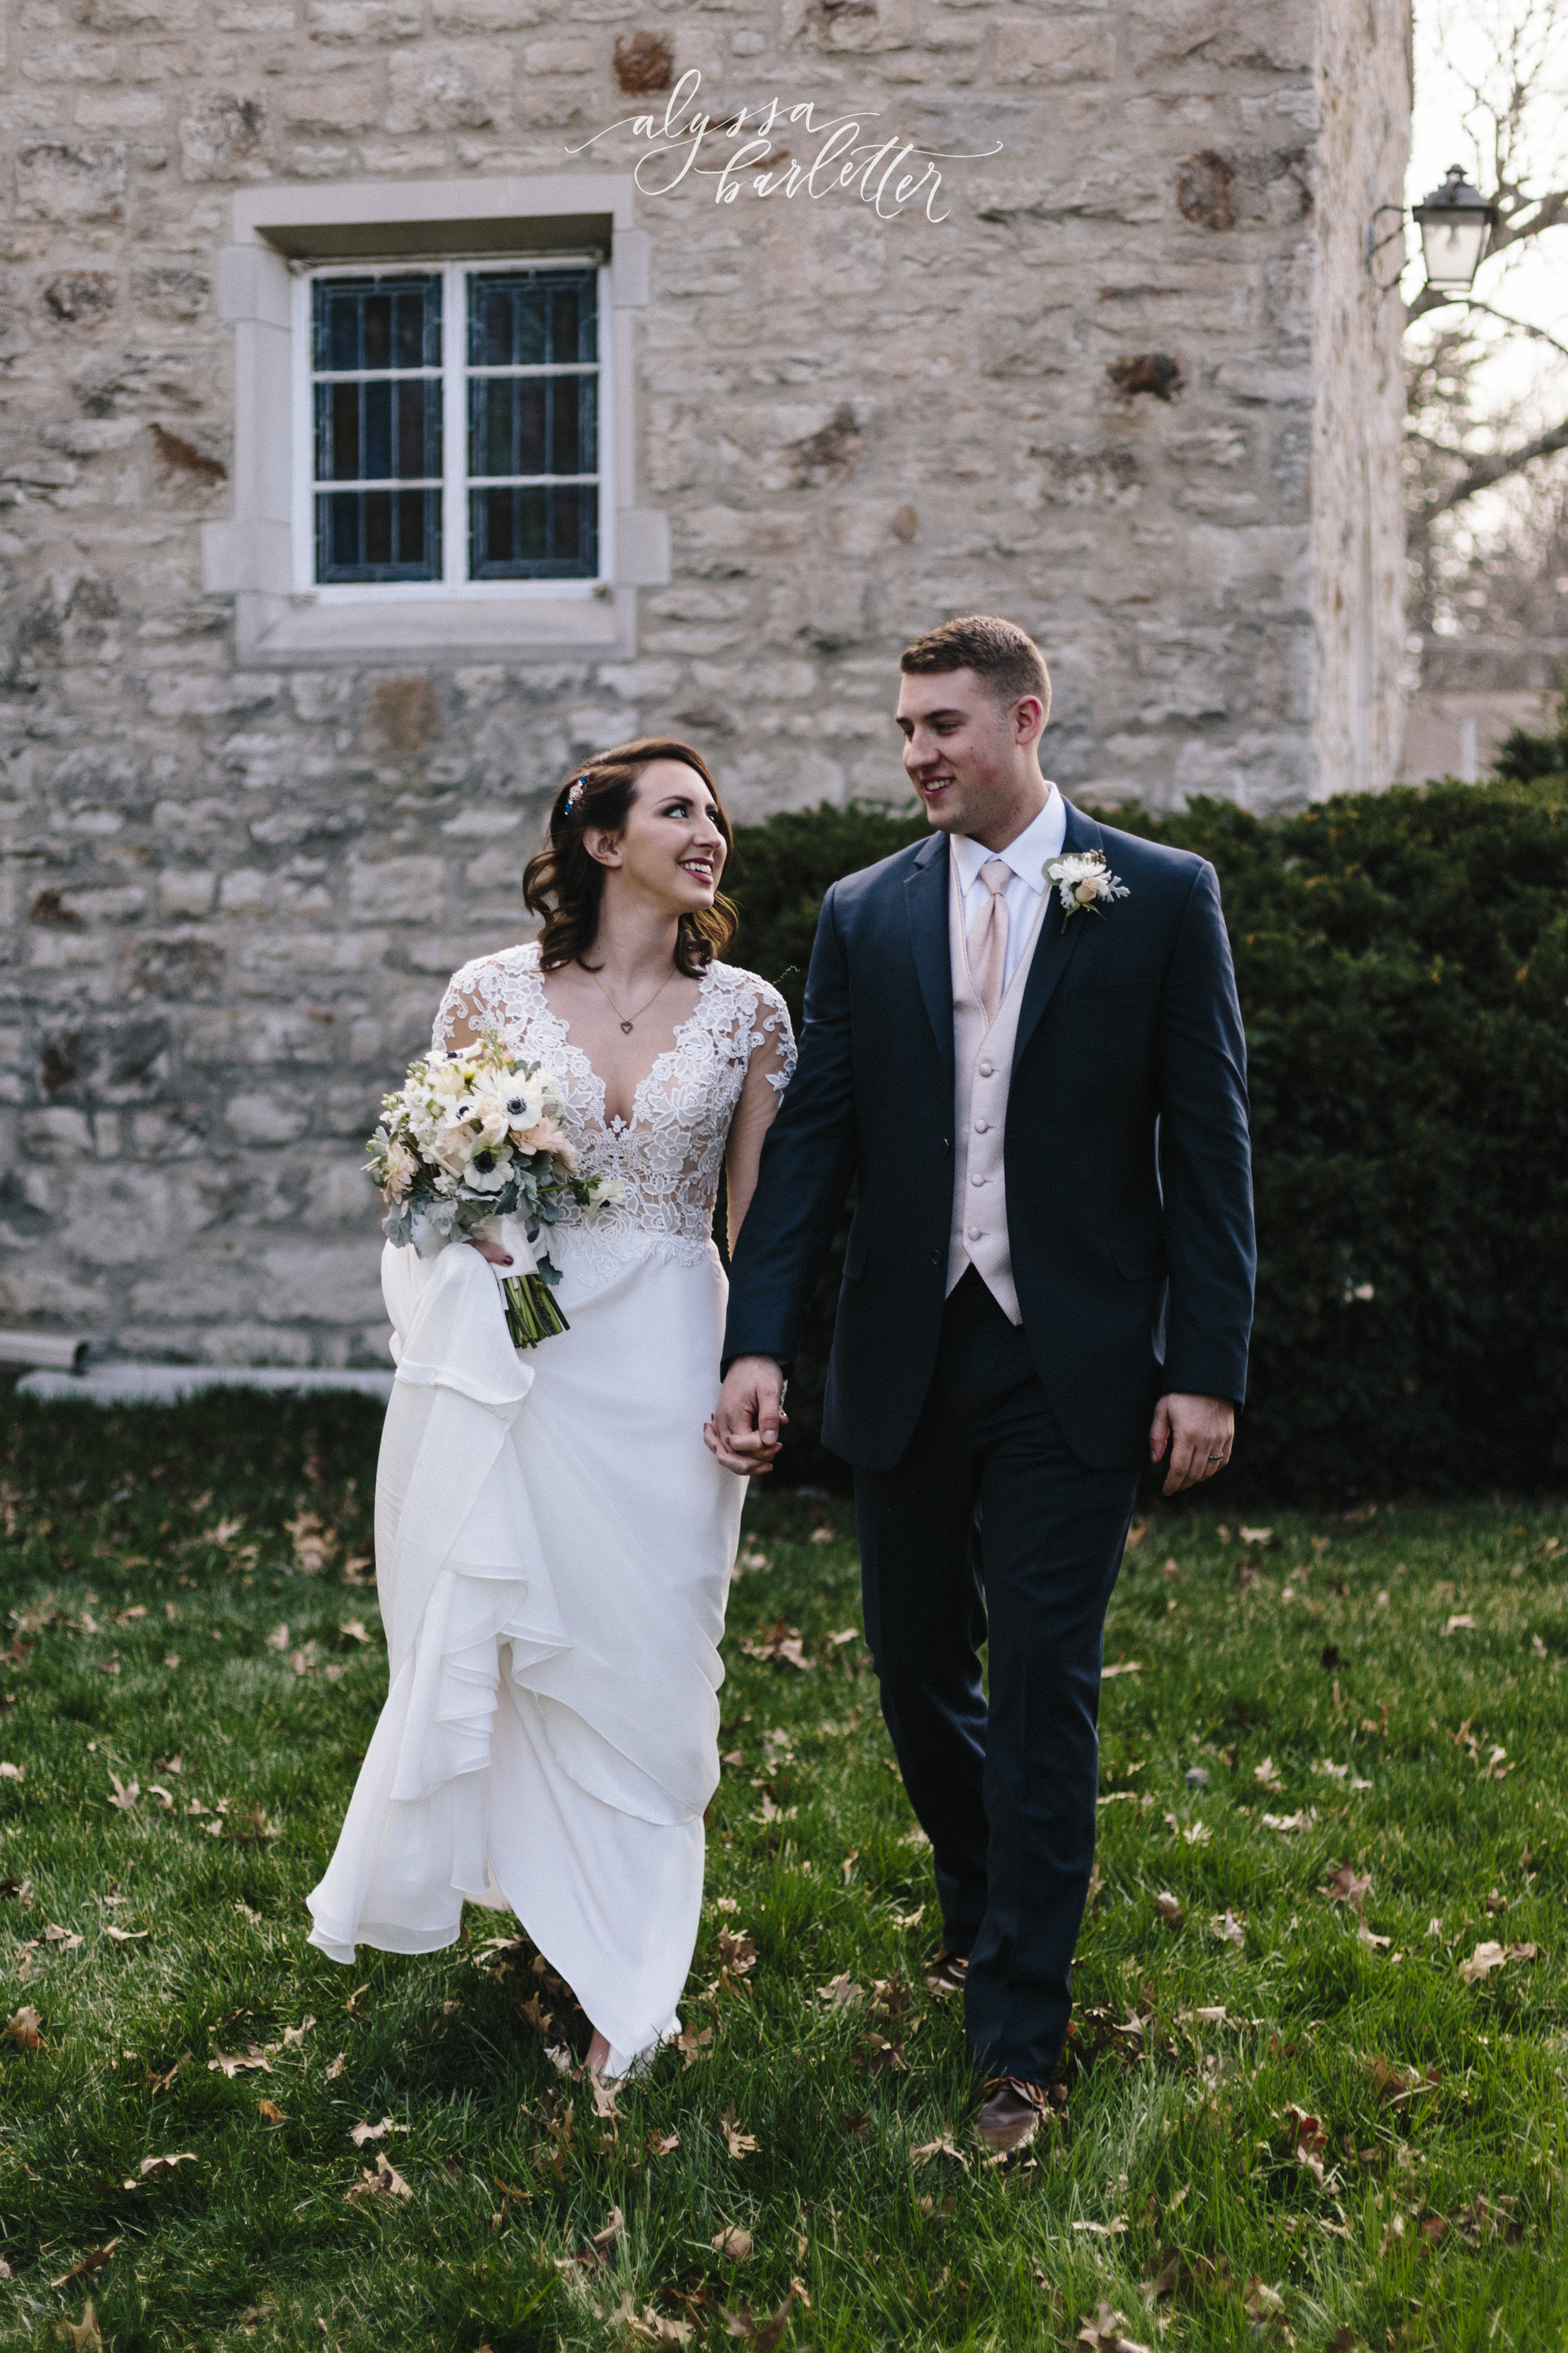 alyssa barletter wedding photography-900-6.jpg